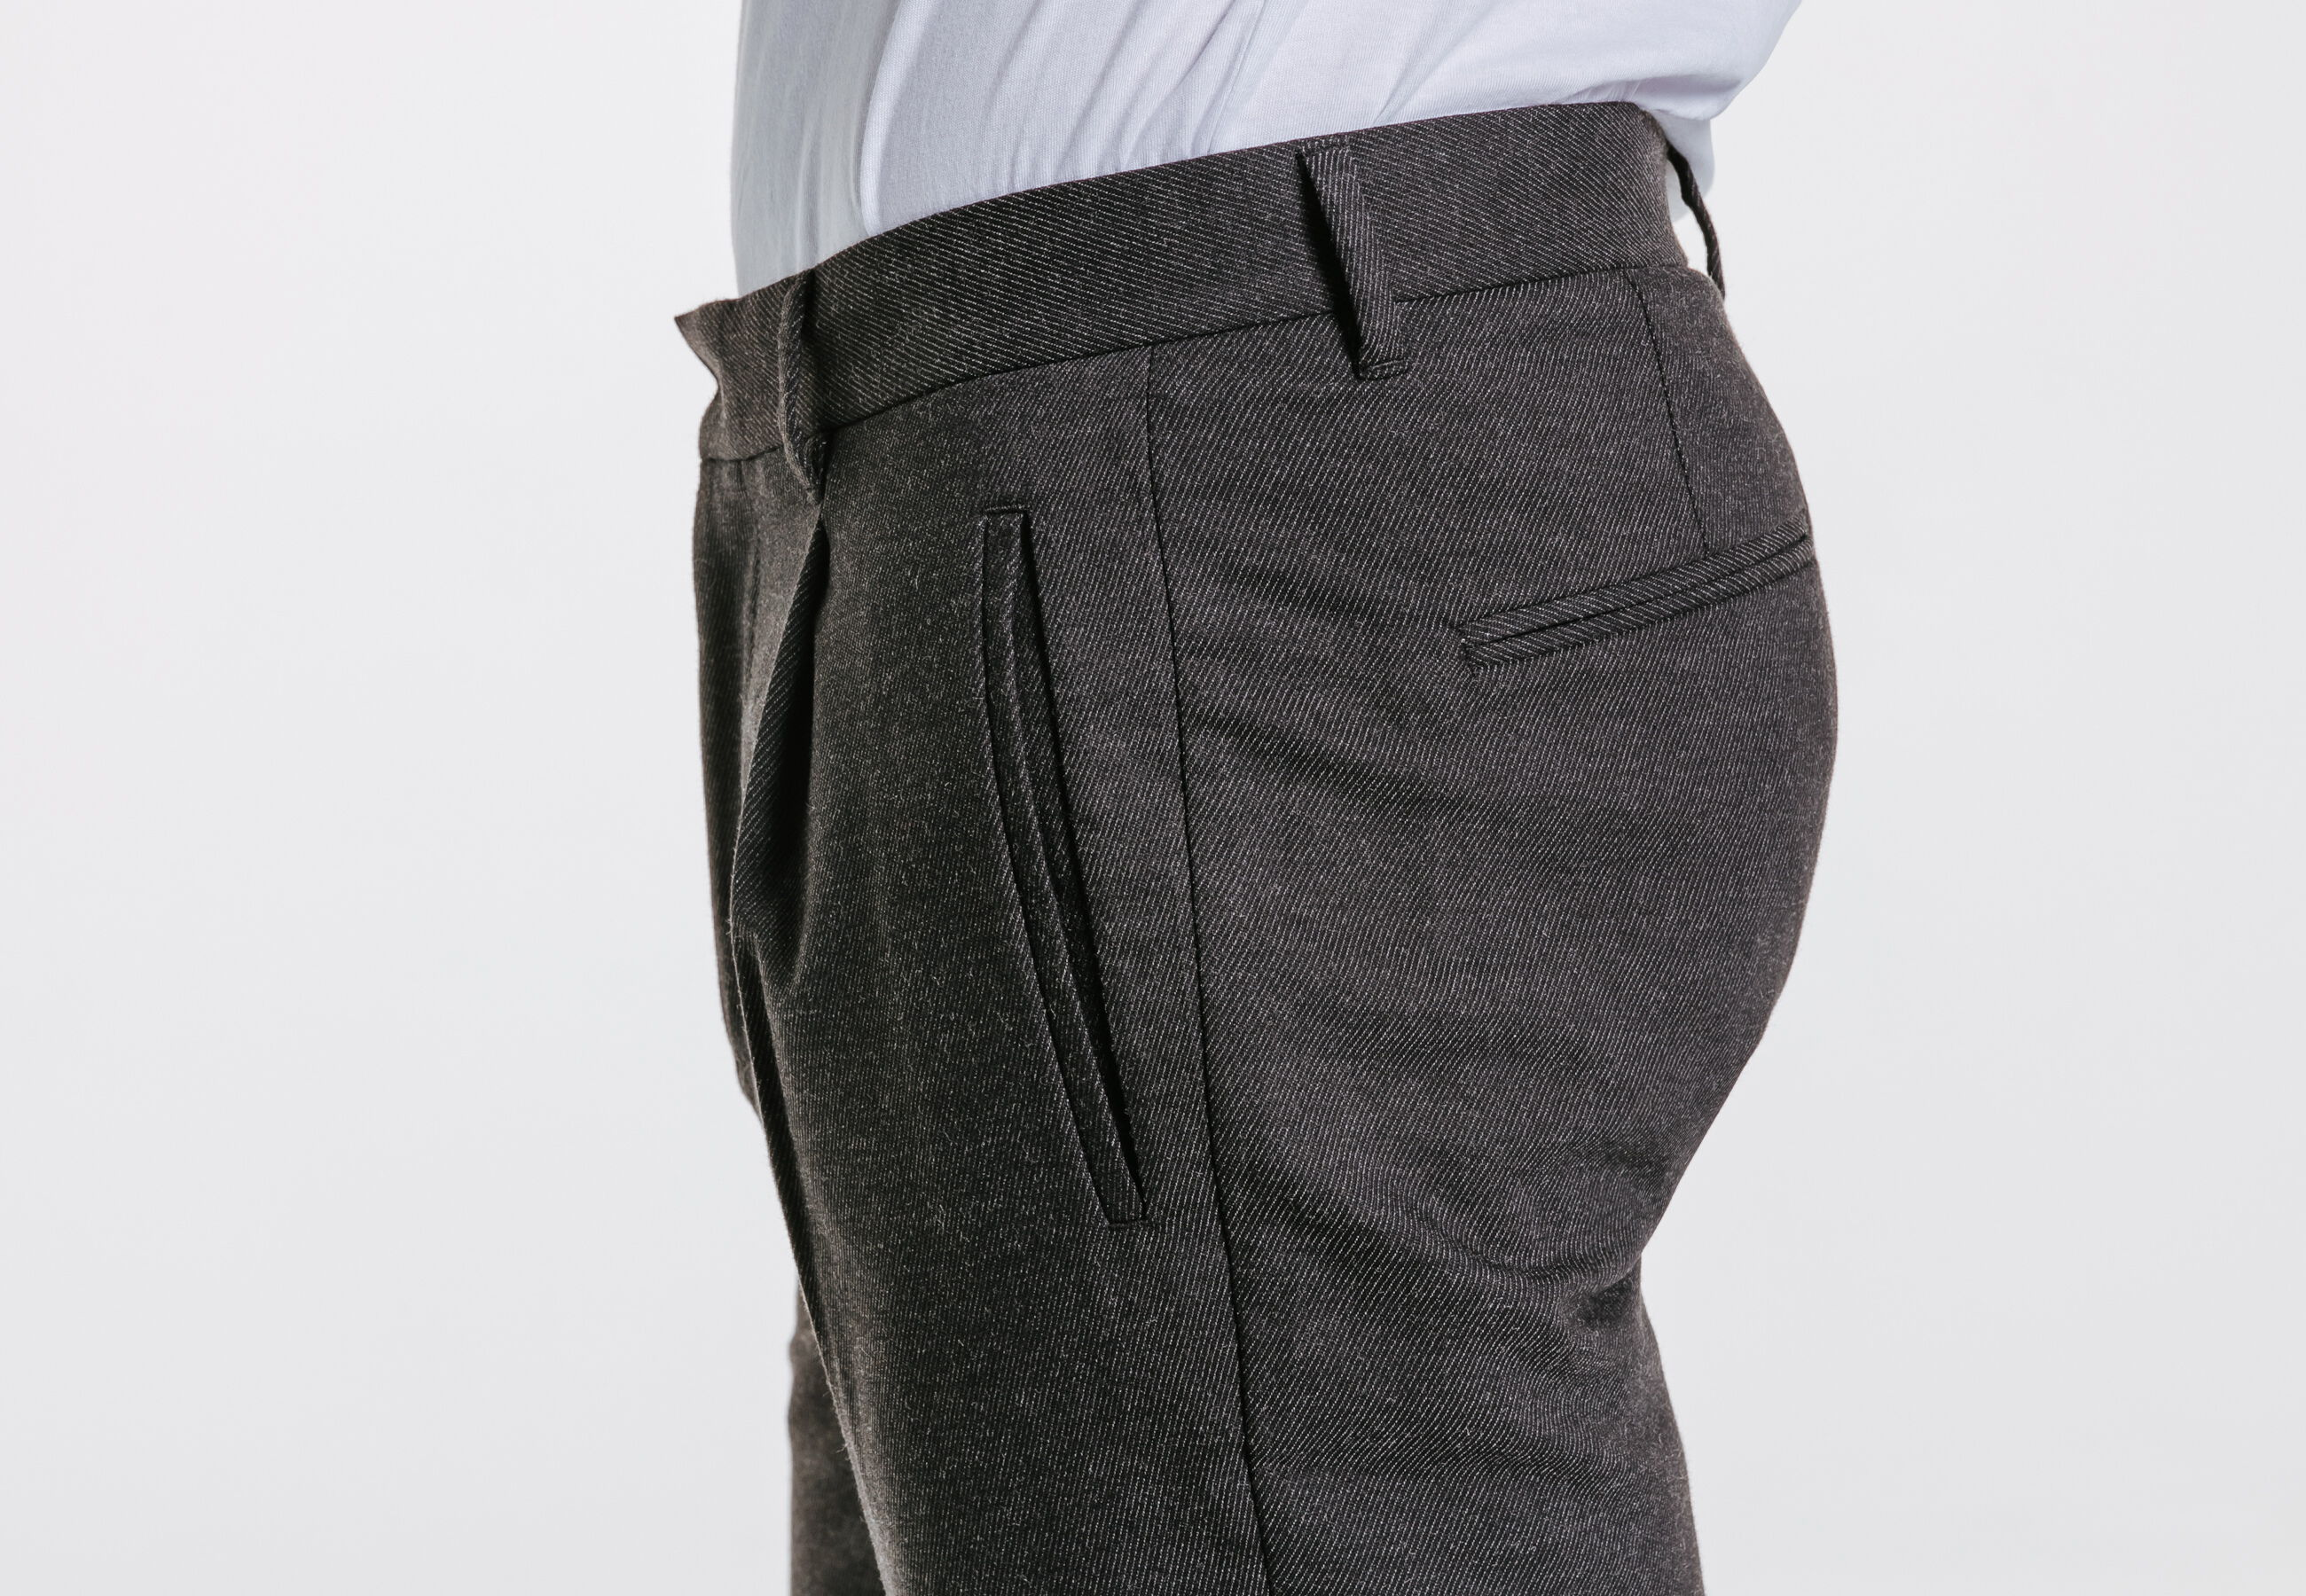 pantalon chino slim revers chevilles gris homme jules. Black Bedroom Furniture Sets. Home Design Ideas